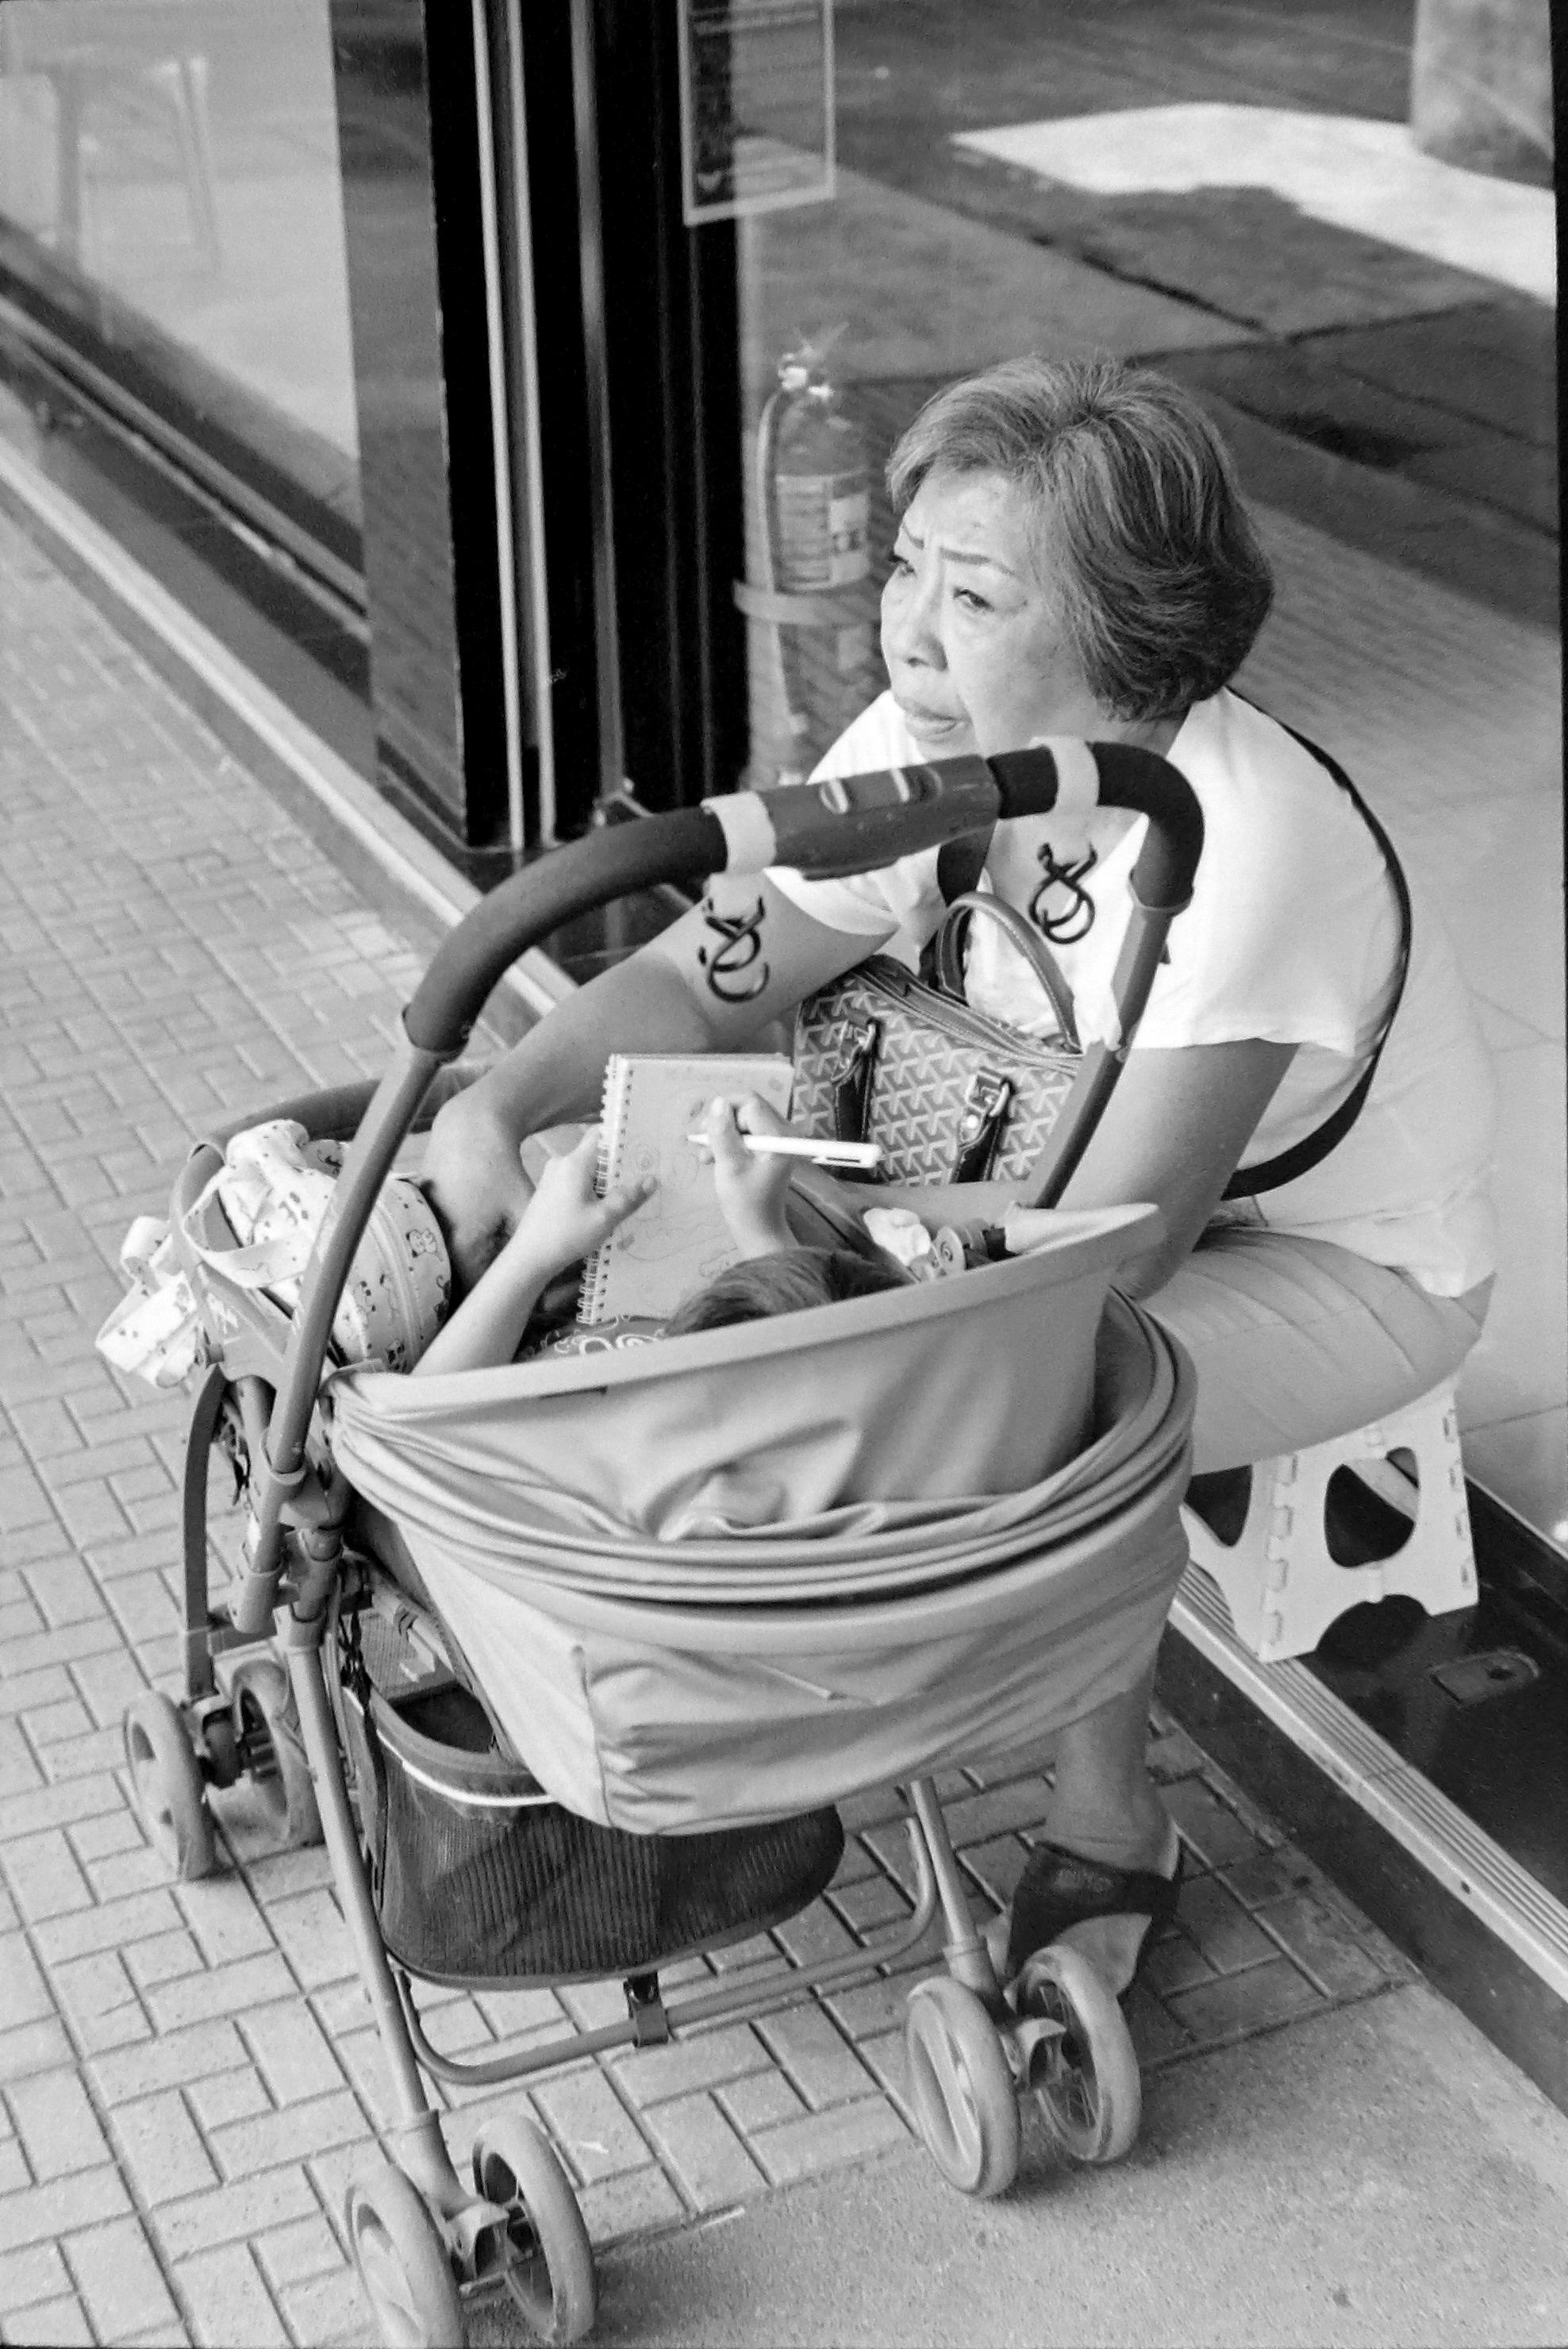 chromacomaphoto street photography bangkok thailand film tri x summicron rigid 50 leica m4 black and white (7).JPG